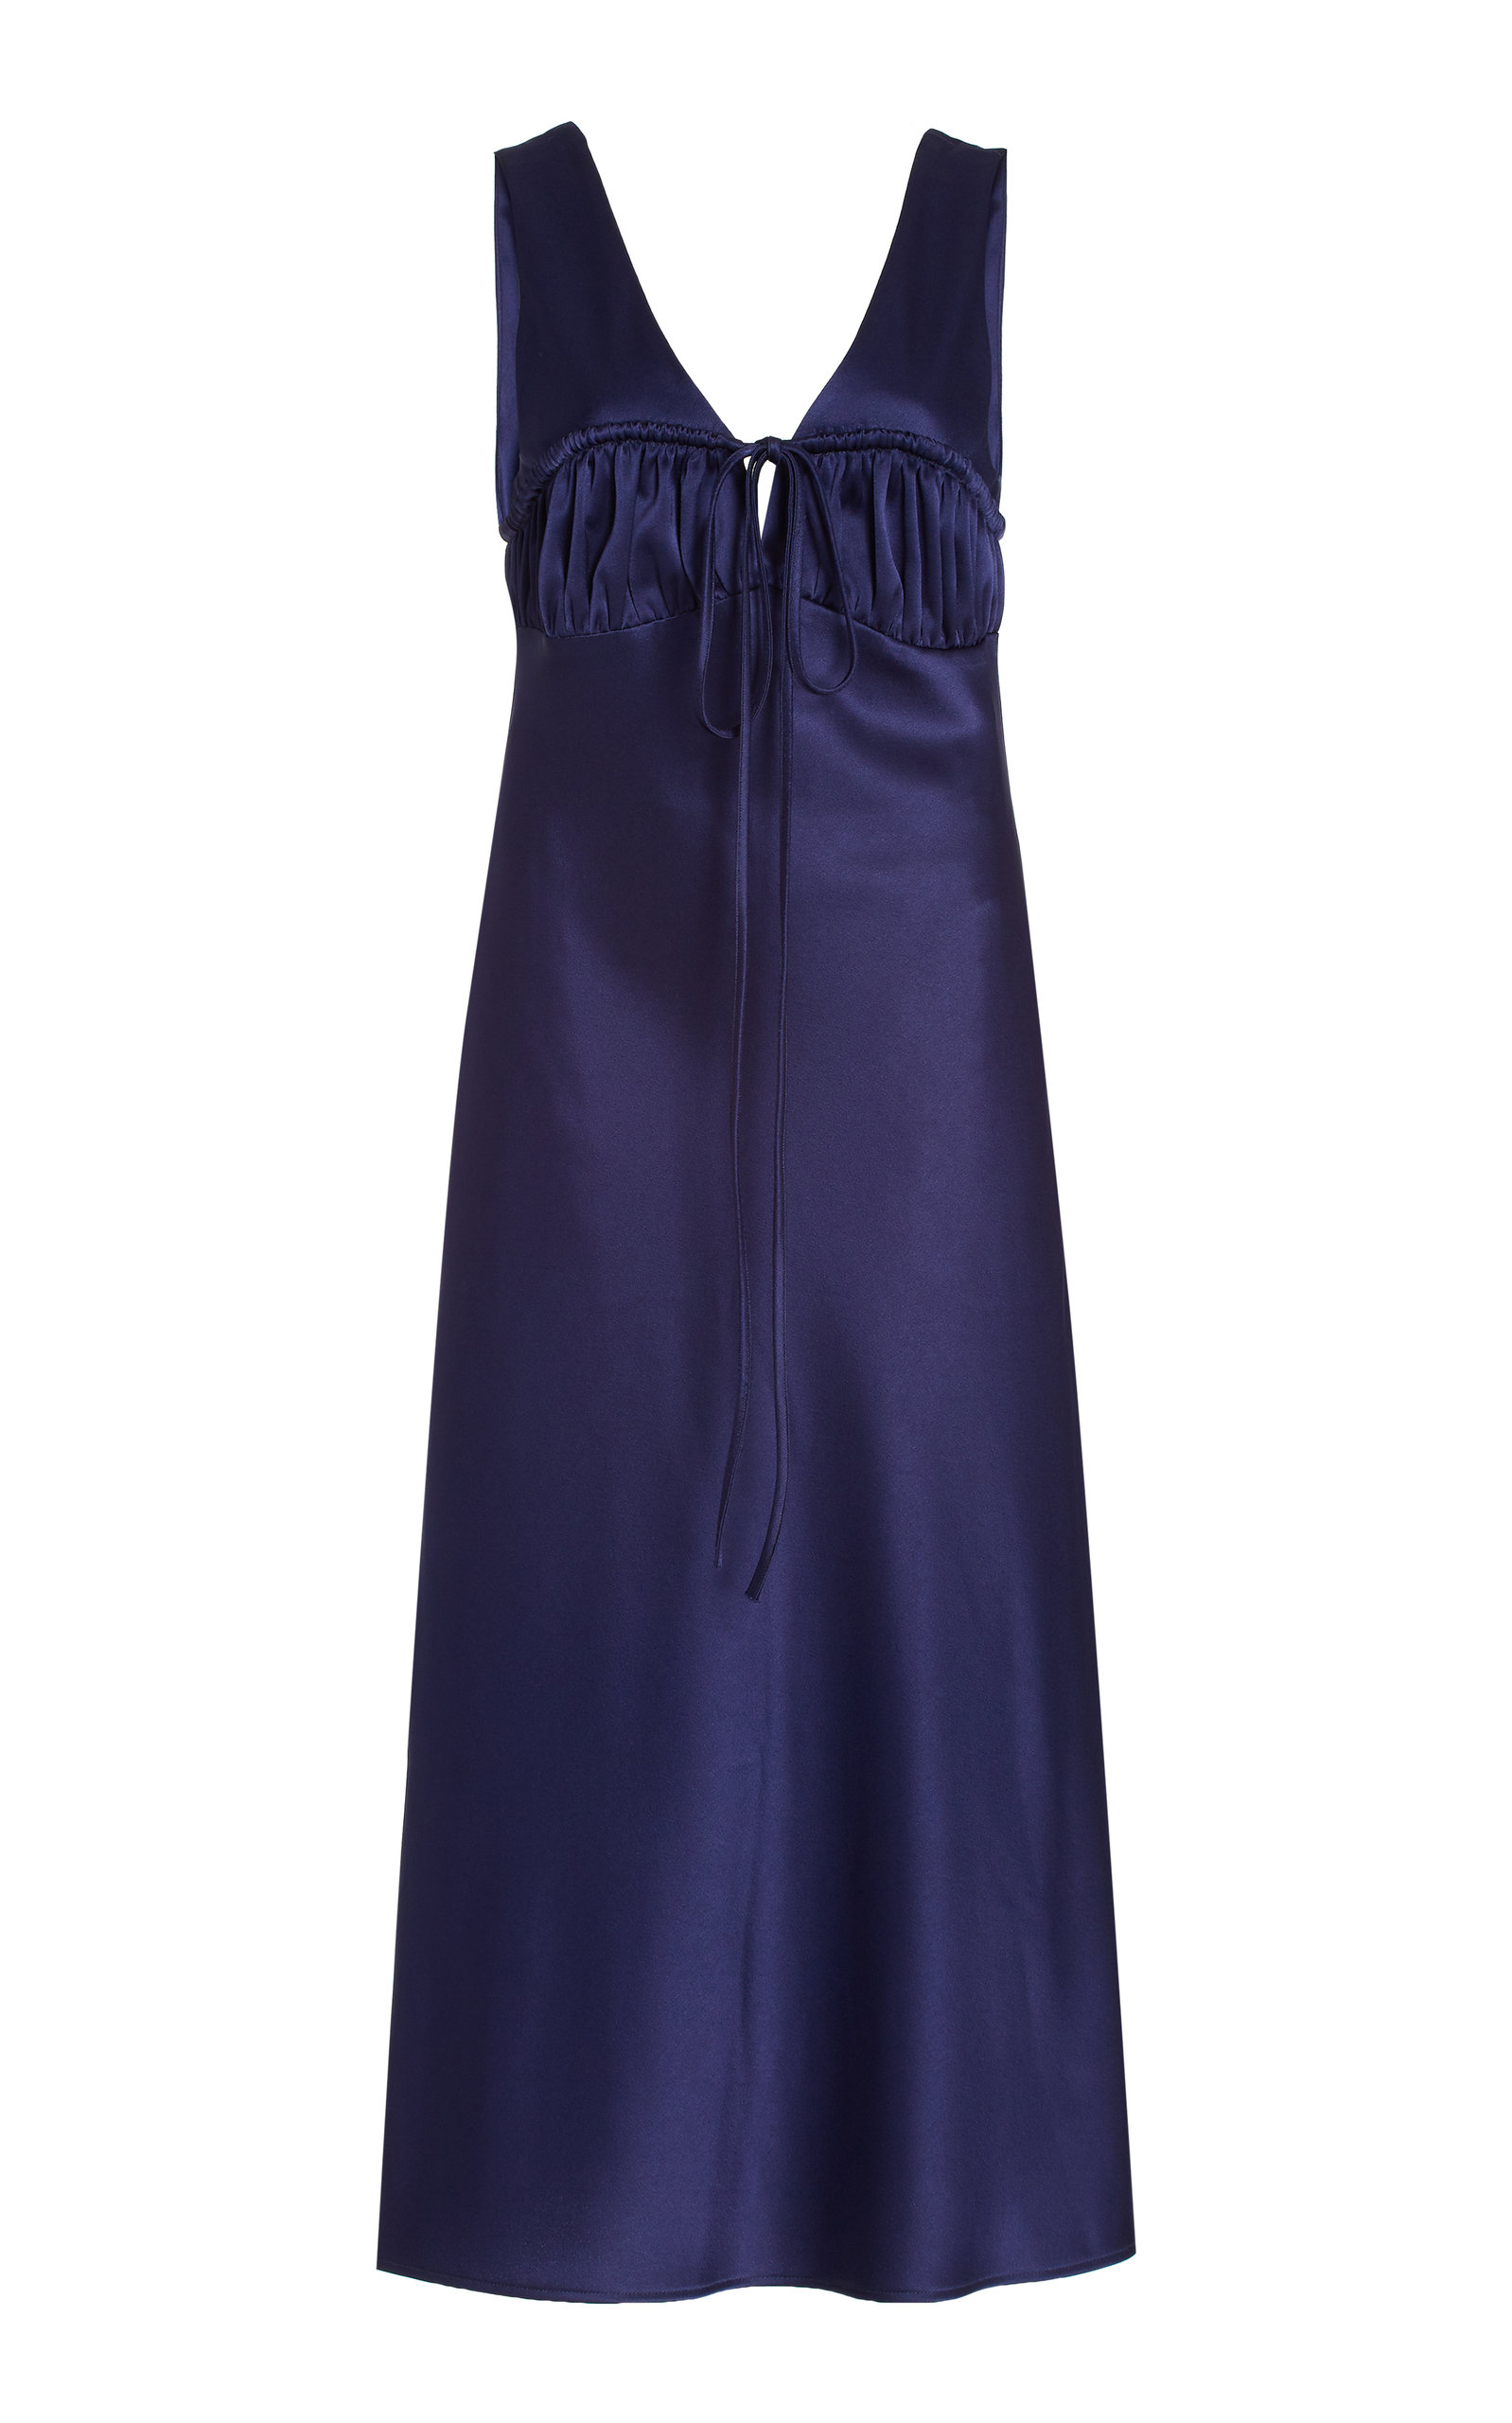 Women's Carolinne Tie-Accented Satin Midi Dress